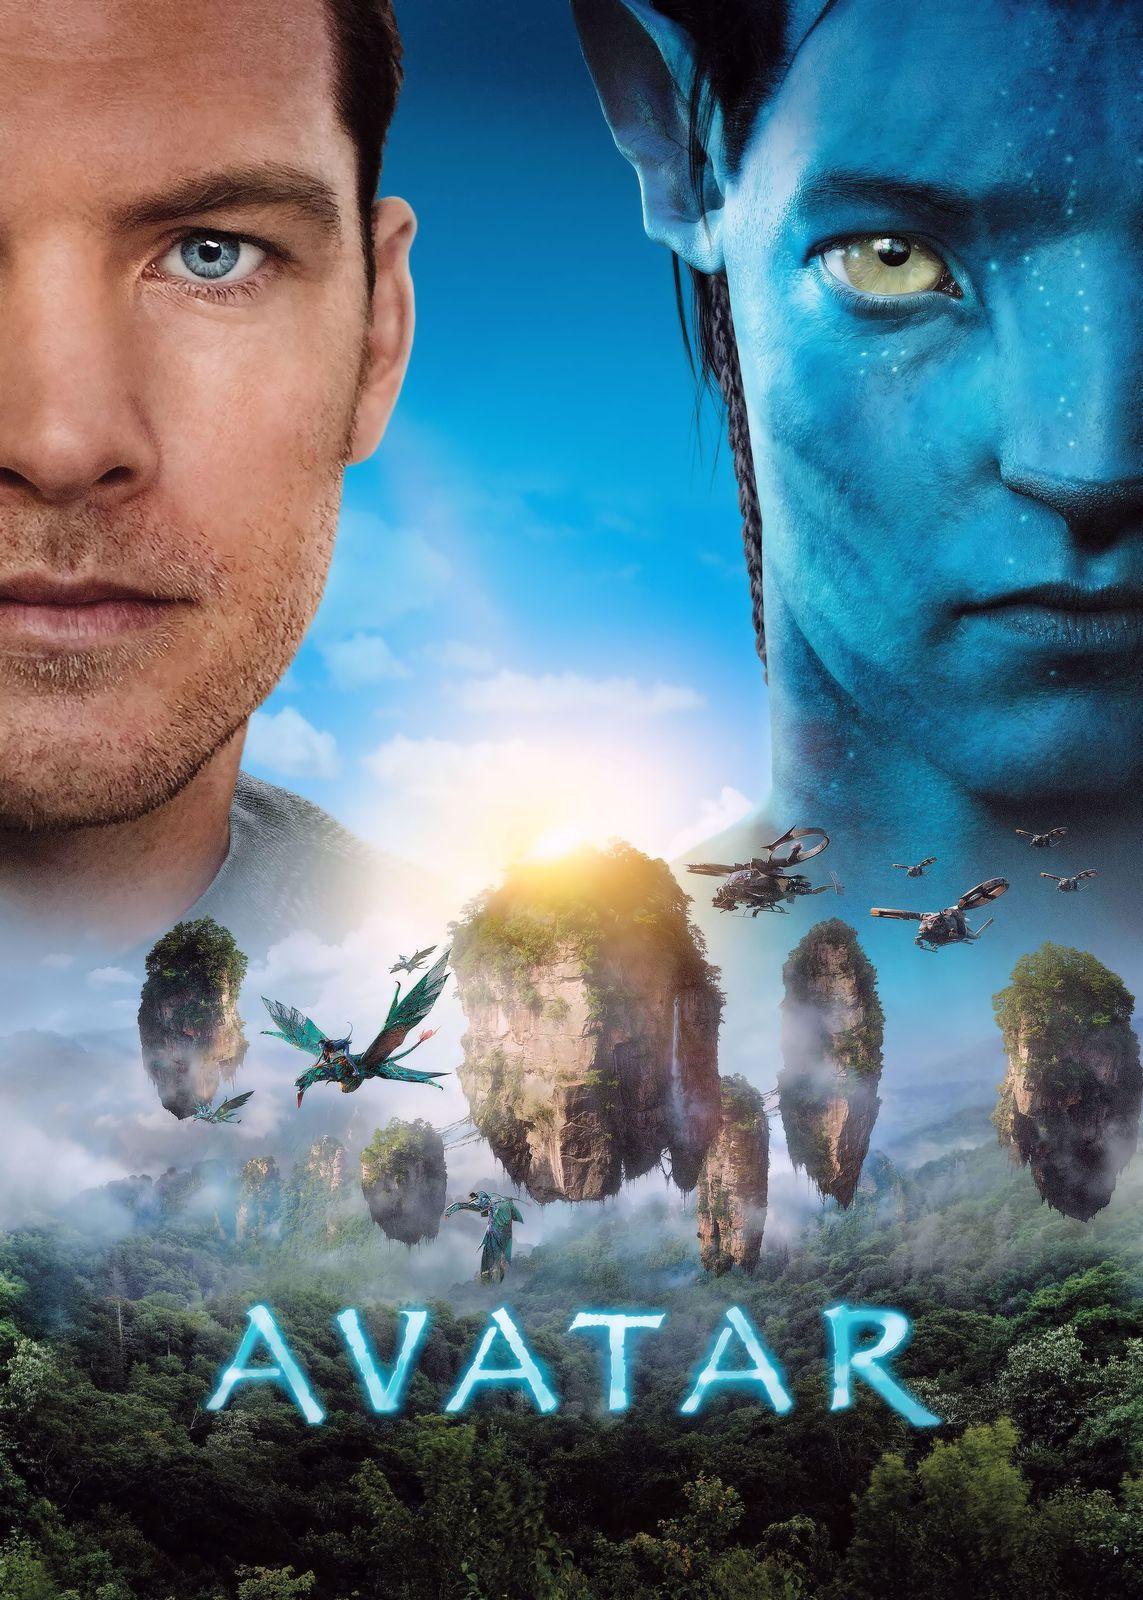 Avatar 2009 002 Movie Poster 27 X 40 Printed On Premium Photo Paper Avatar Movie Avatar Poster Avatar Full Movie